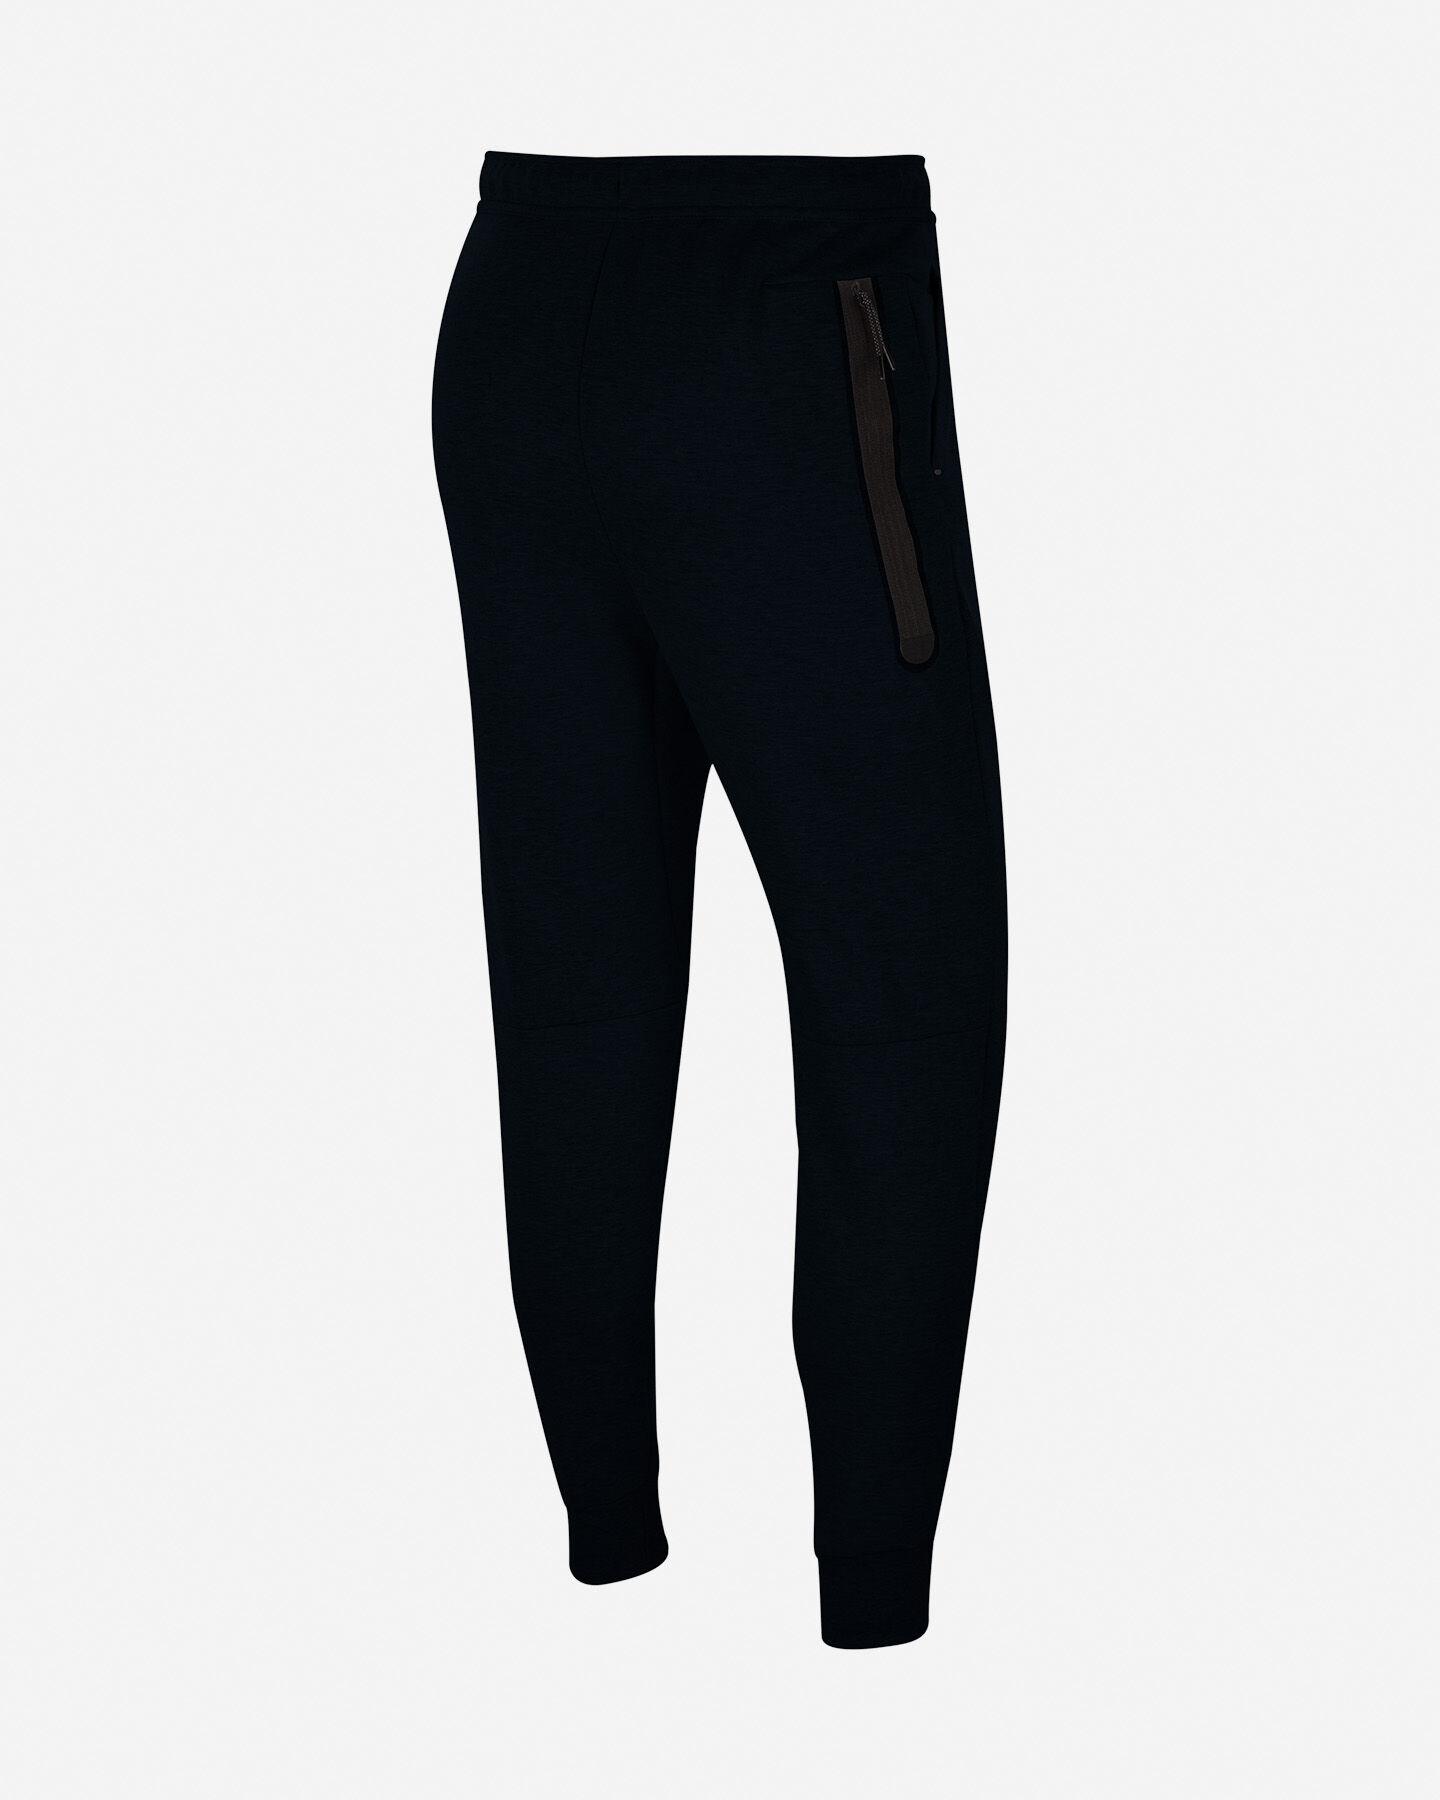 Pantalone NIKE TECH FLEECE M S5223279 scatto 1